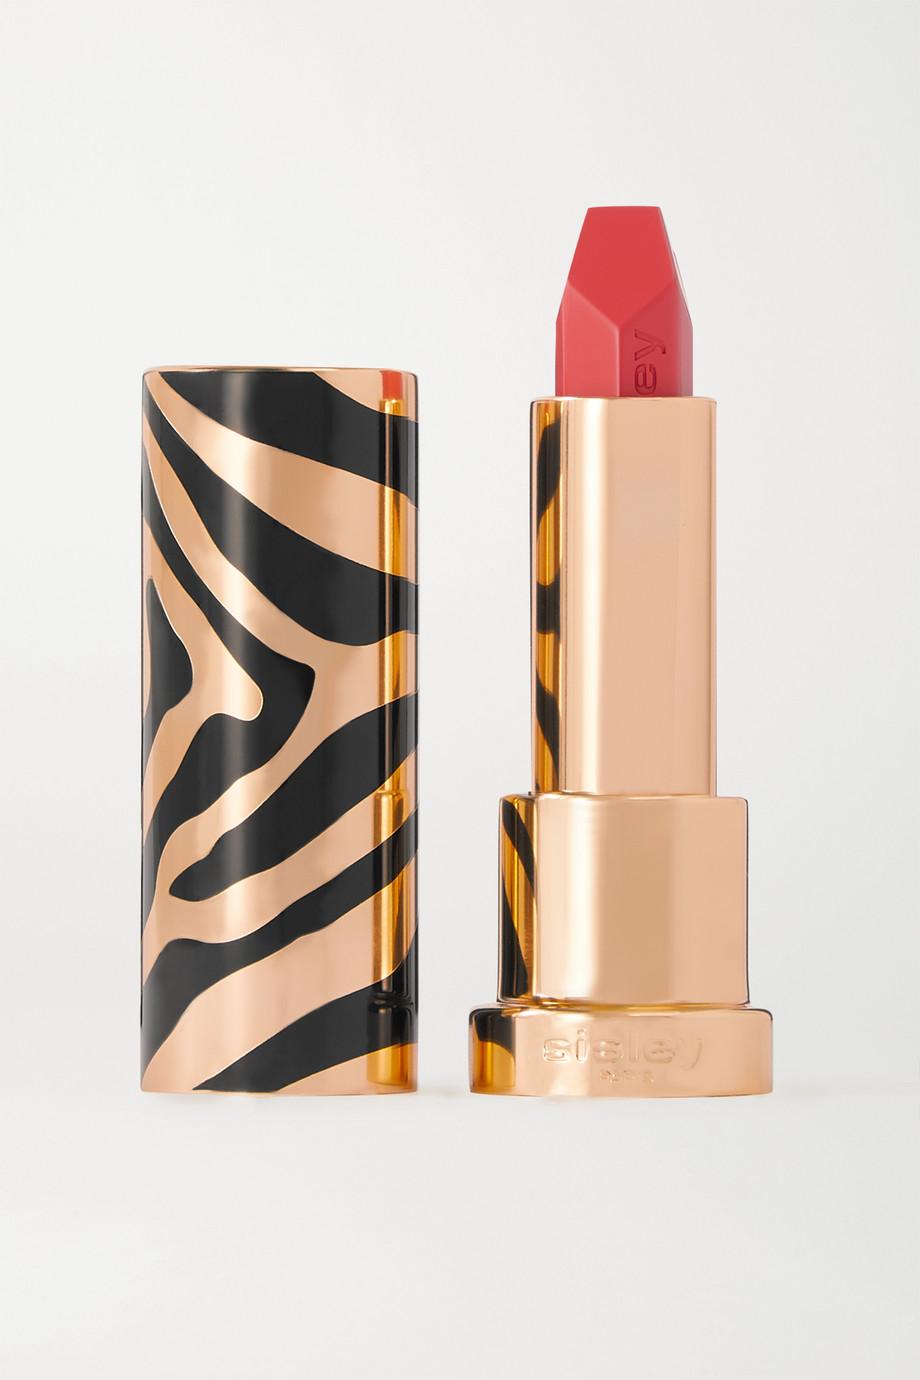 Sisley Le Phyto Rouge Lipstick - 28 Rose Shanghai